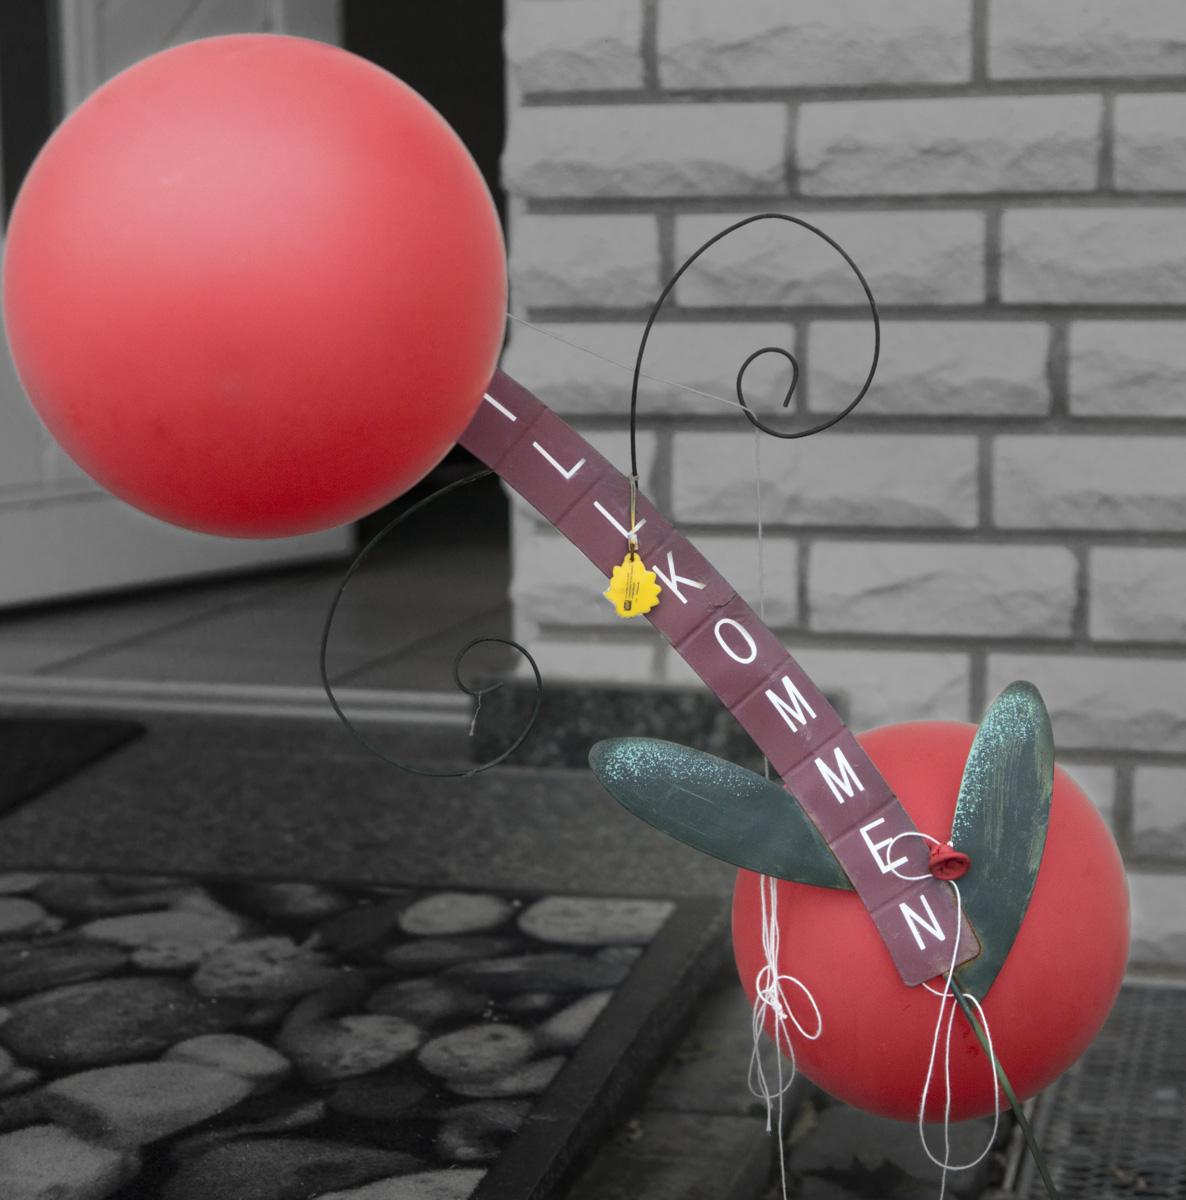 Ballonwettbewerb-03